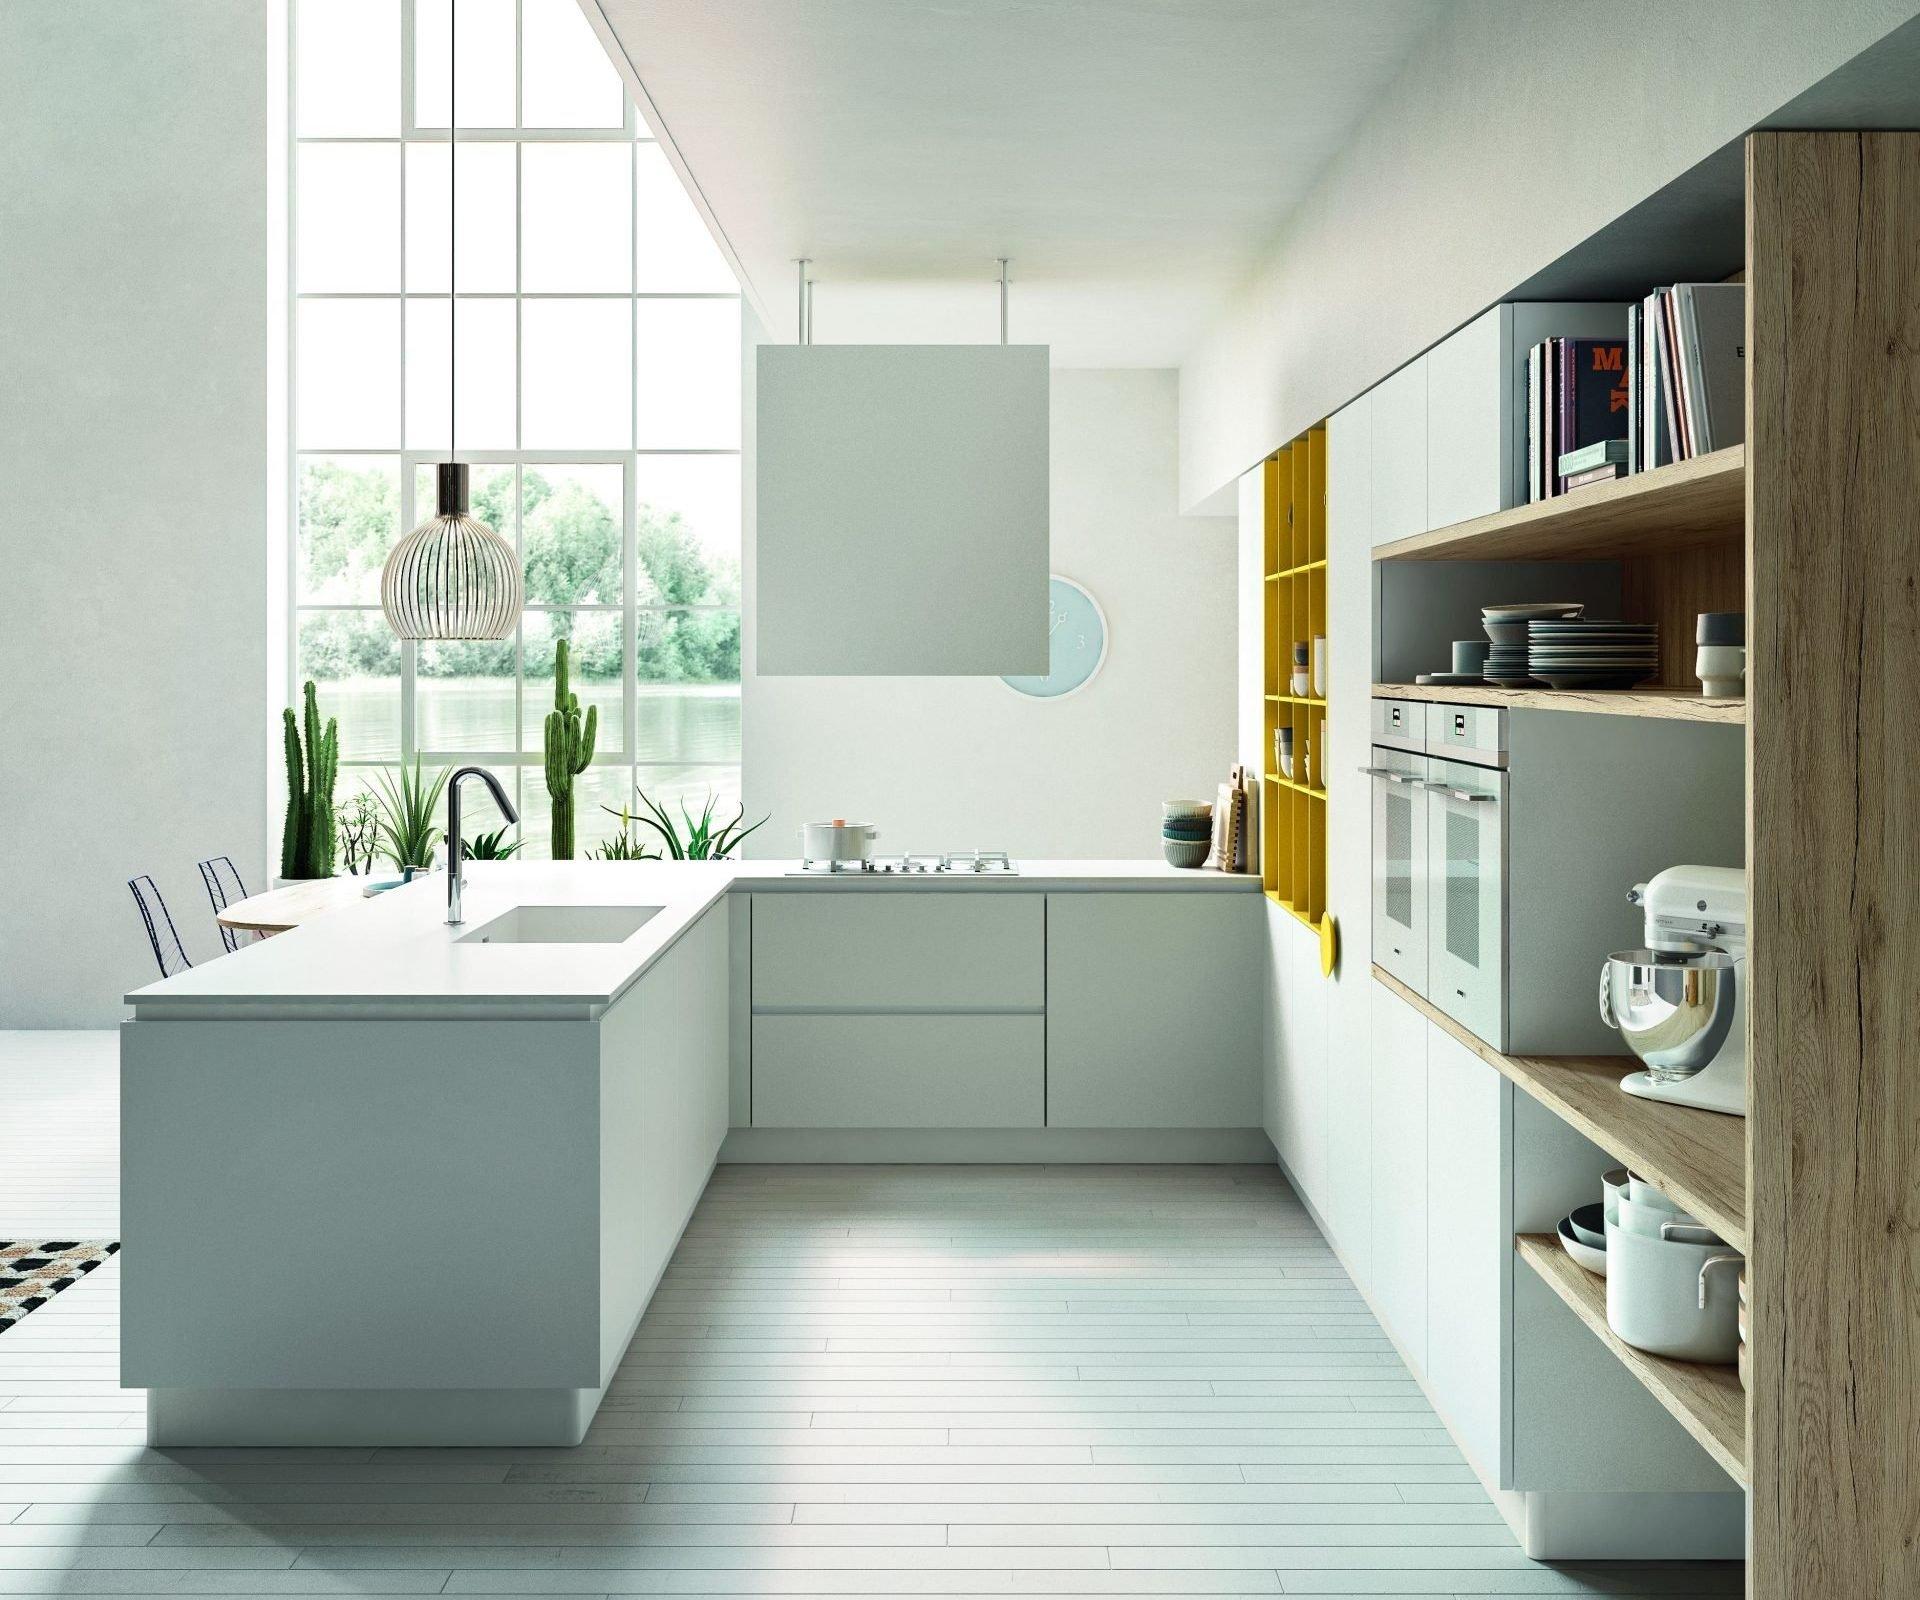 Cucina bianca moderna con sviluppo a C.